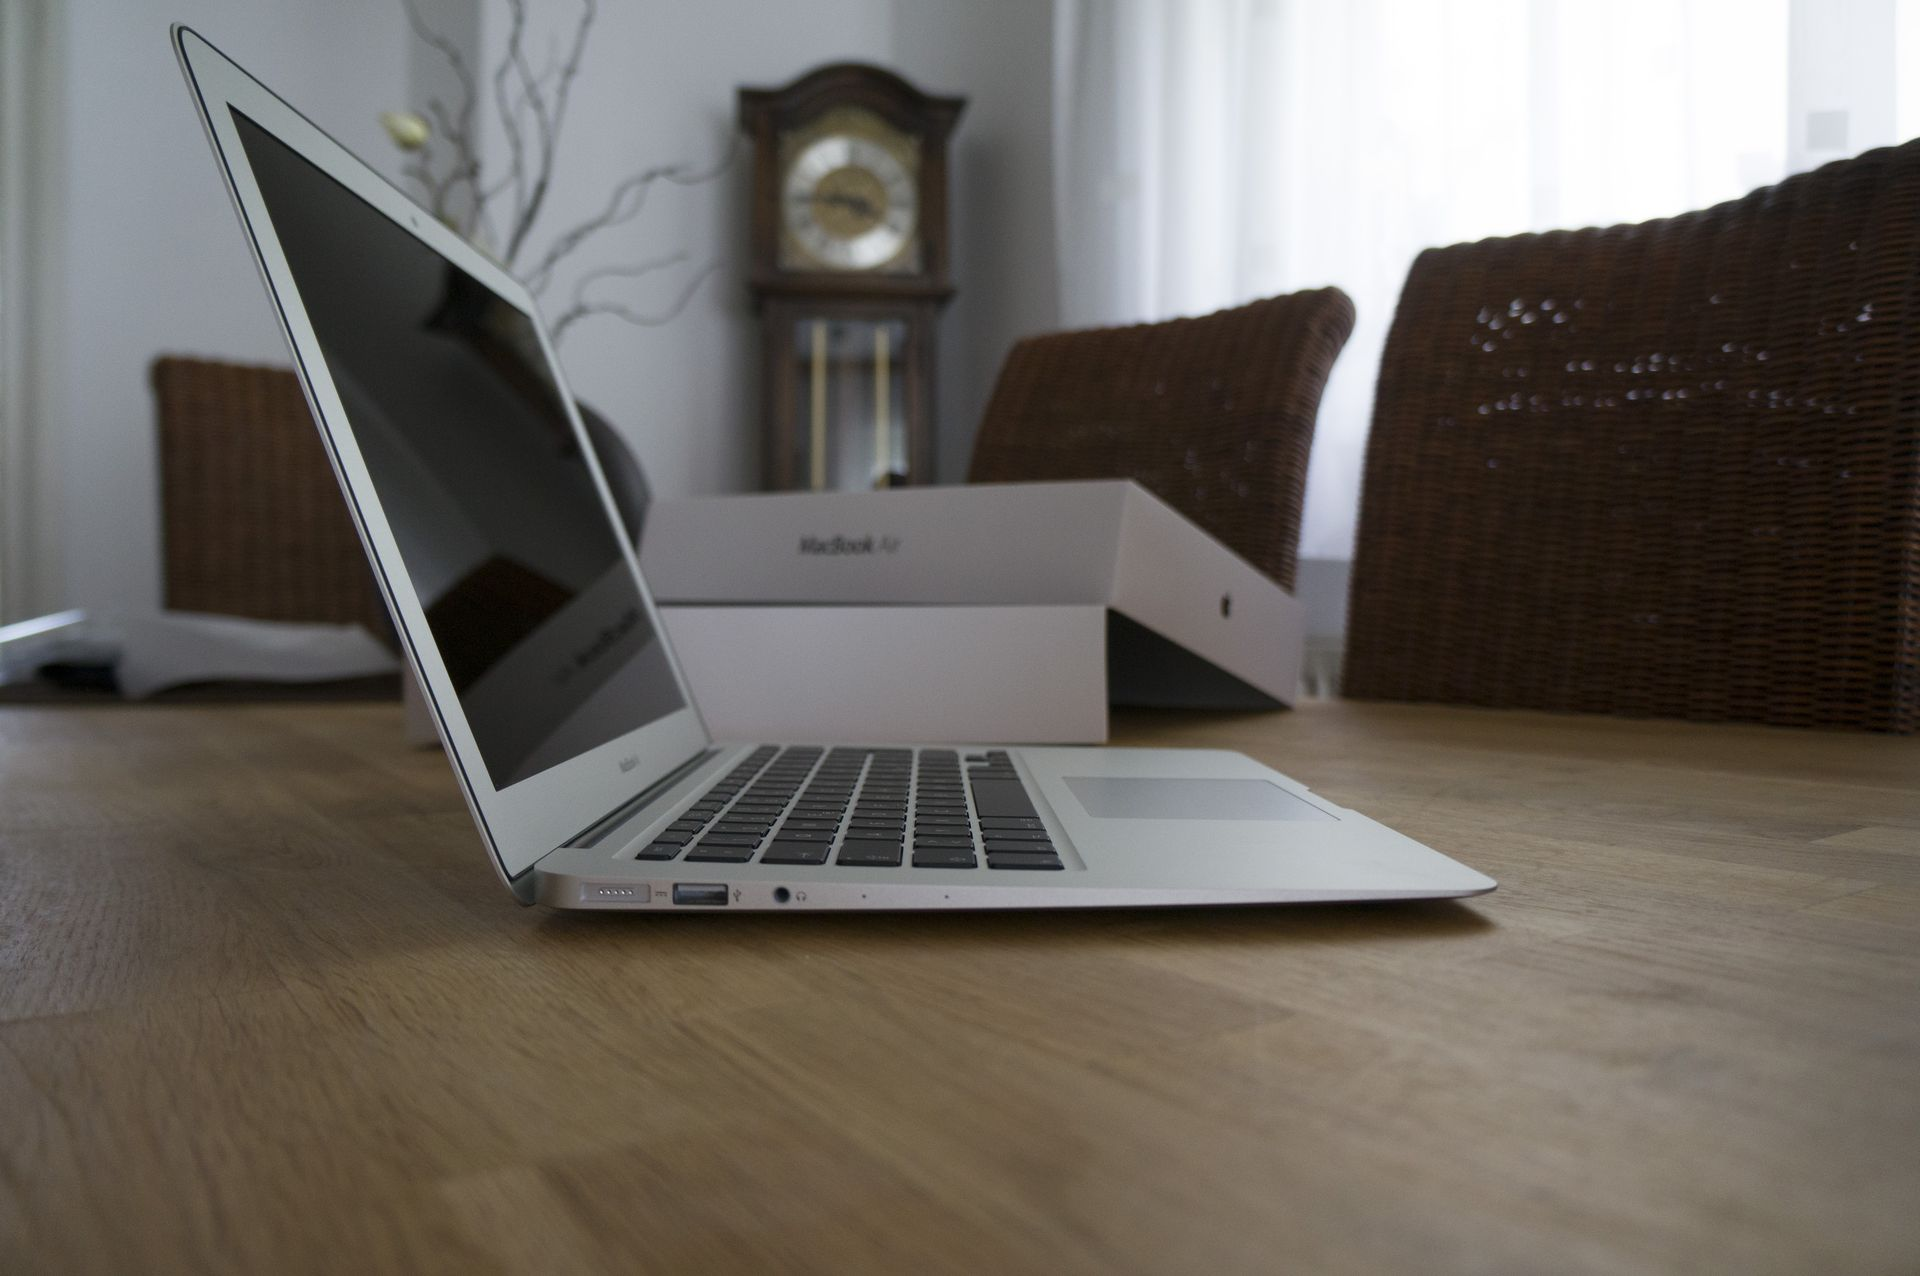 Erfahrungsbericht – MacBook Air 13″ 2014